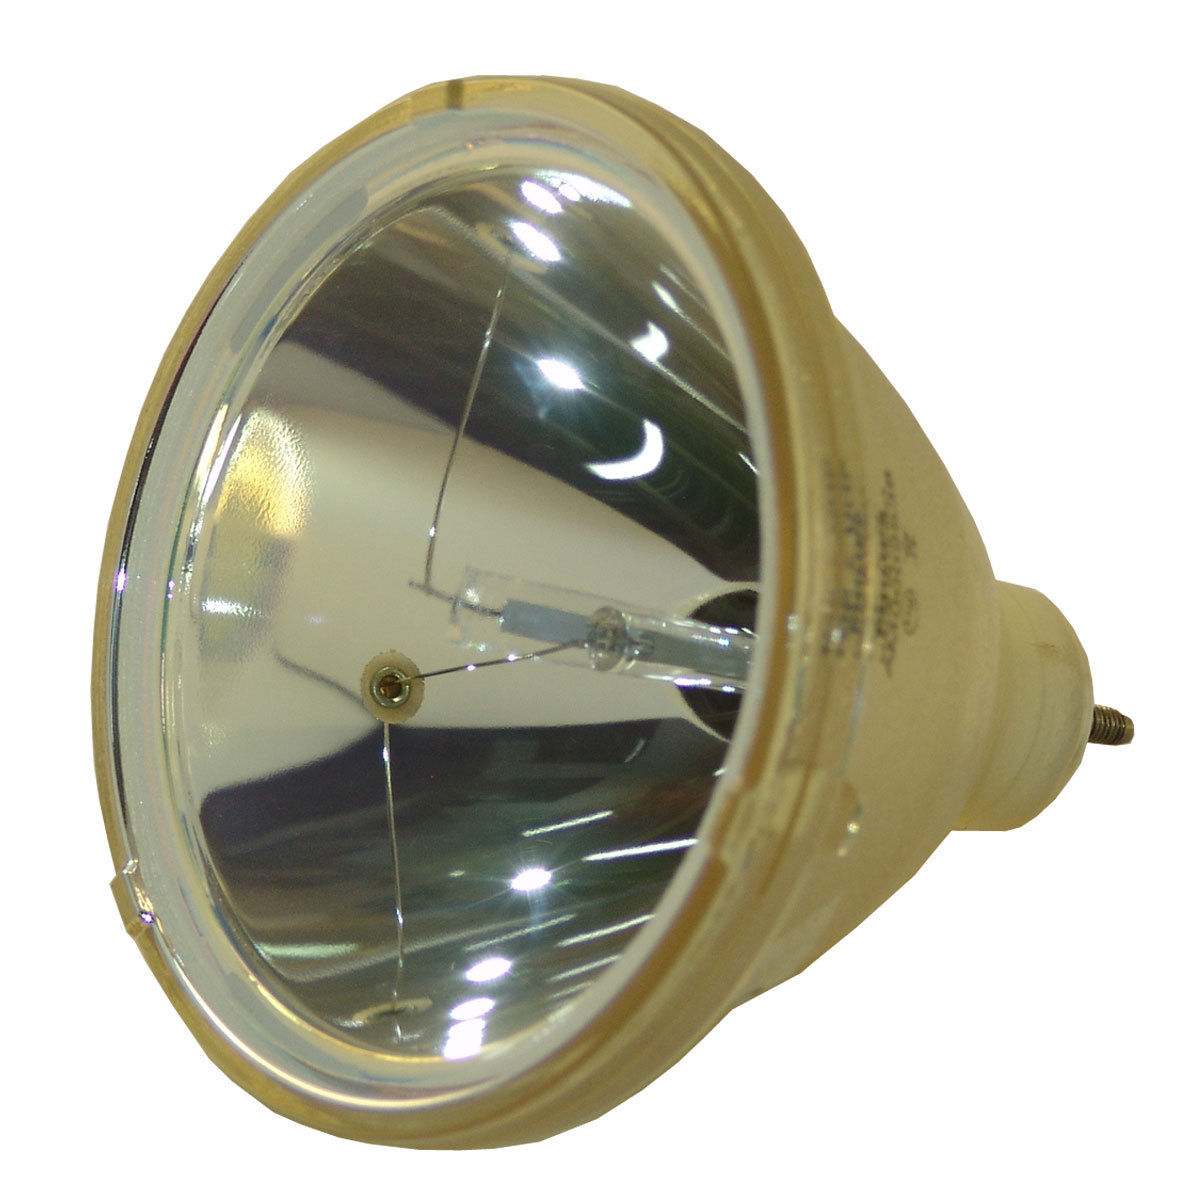 Compatible Bare Bulb POA-LMP17 LMP17 610-276-3010 for SANYO PLC-SP10C PLC-SP10E PLC-SP10N PLC-SP10 PLC-SP10B Projector Lamp Bulb 610 349 7518 poa lmp142 original bare lamp for sanyo plc wk2500 plc xd2600 xd2200 plc xe34 plc xk2200 plc xk2600 plc xk3010